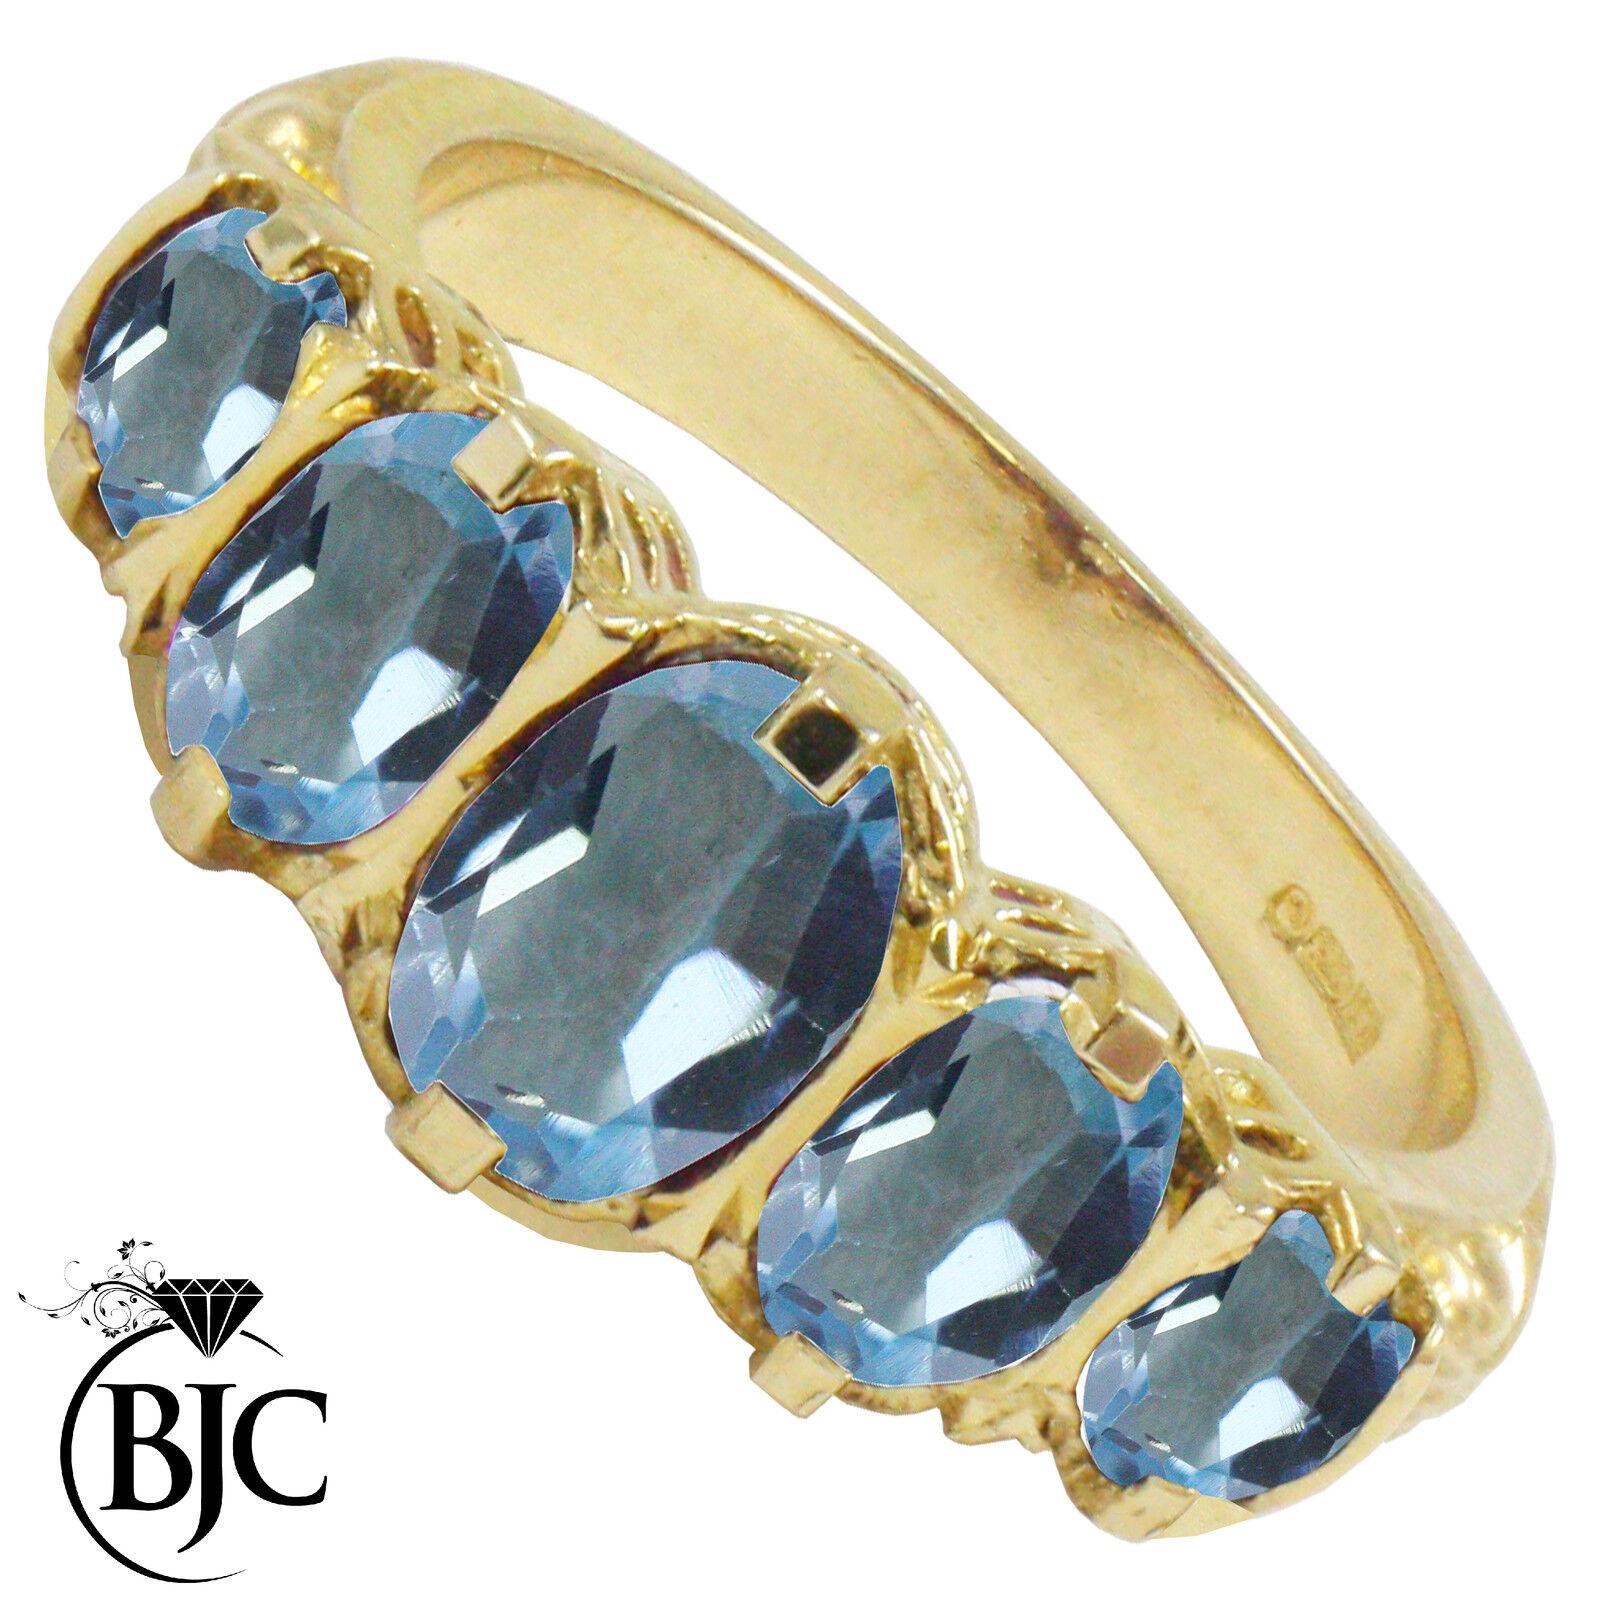 BJC® 9ct Yellow gold Victorian   Gypsy Style Graduating bluee Topaz 5 Stone Ring